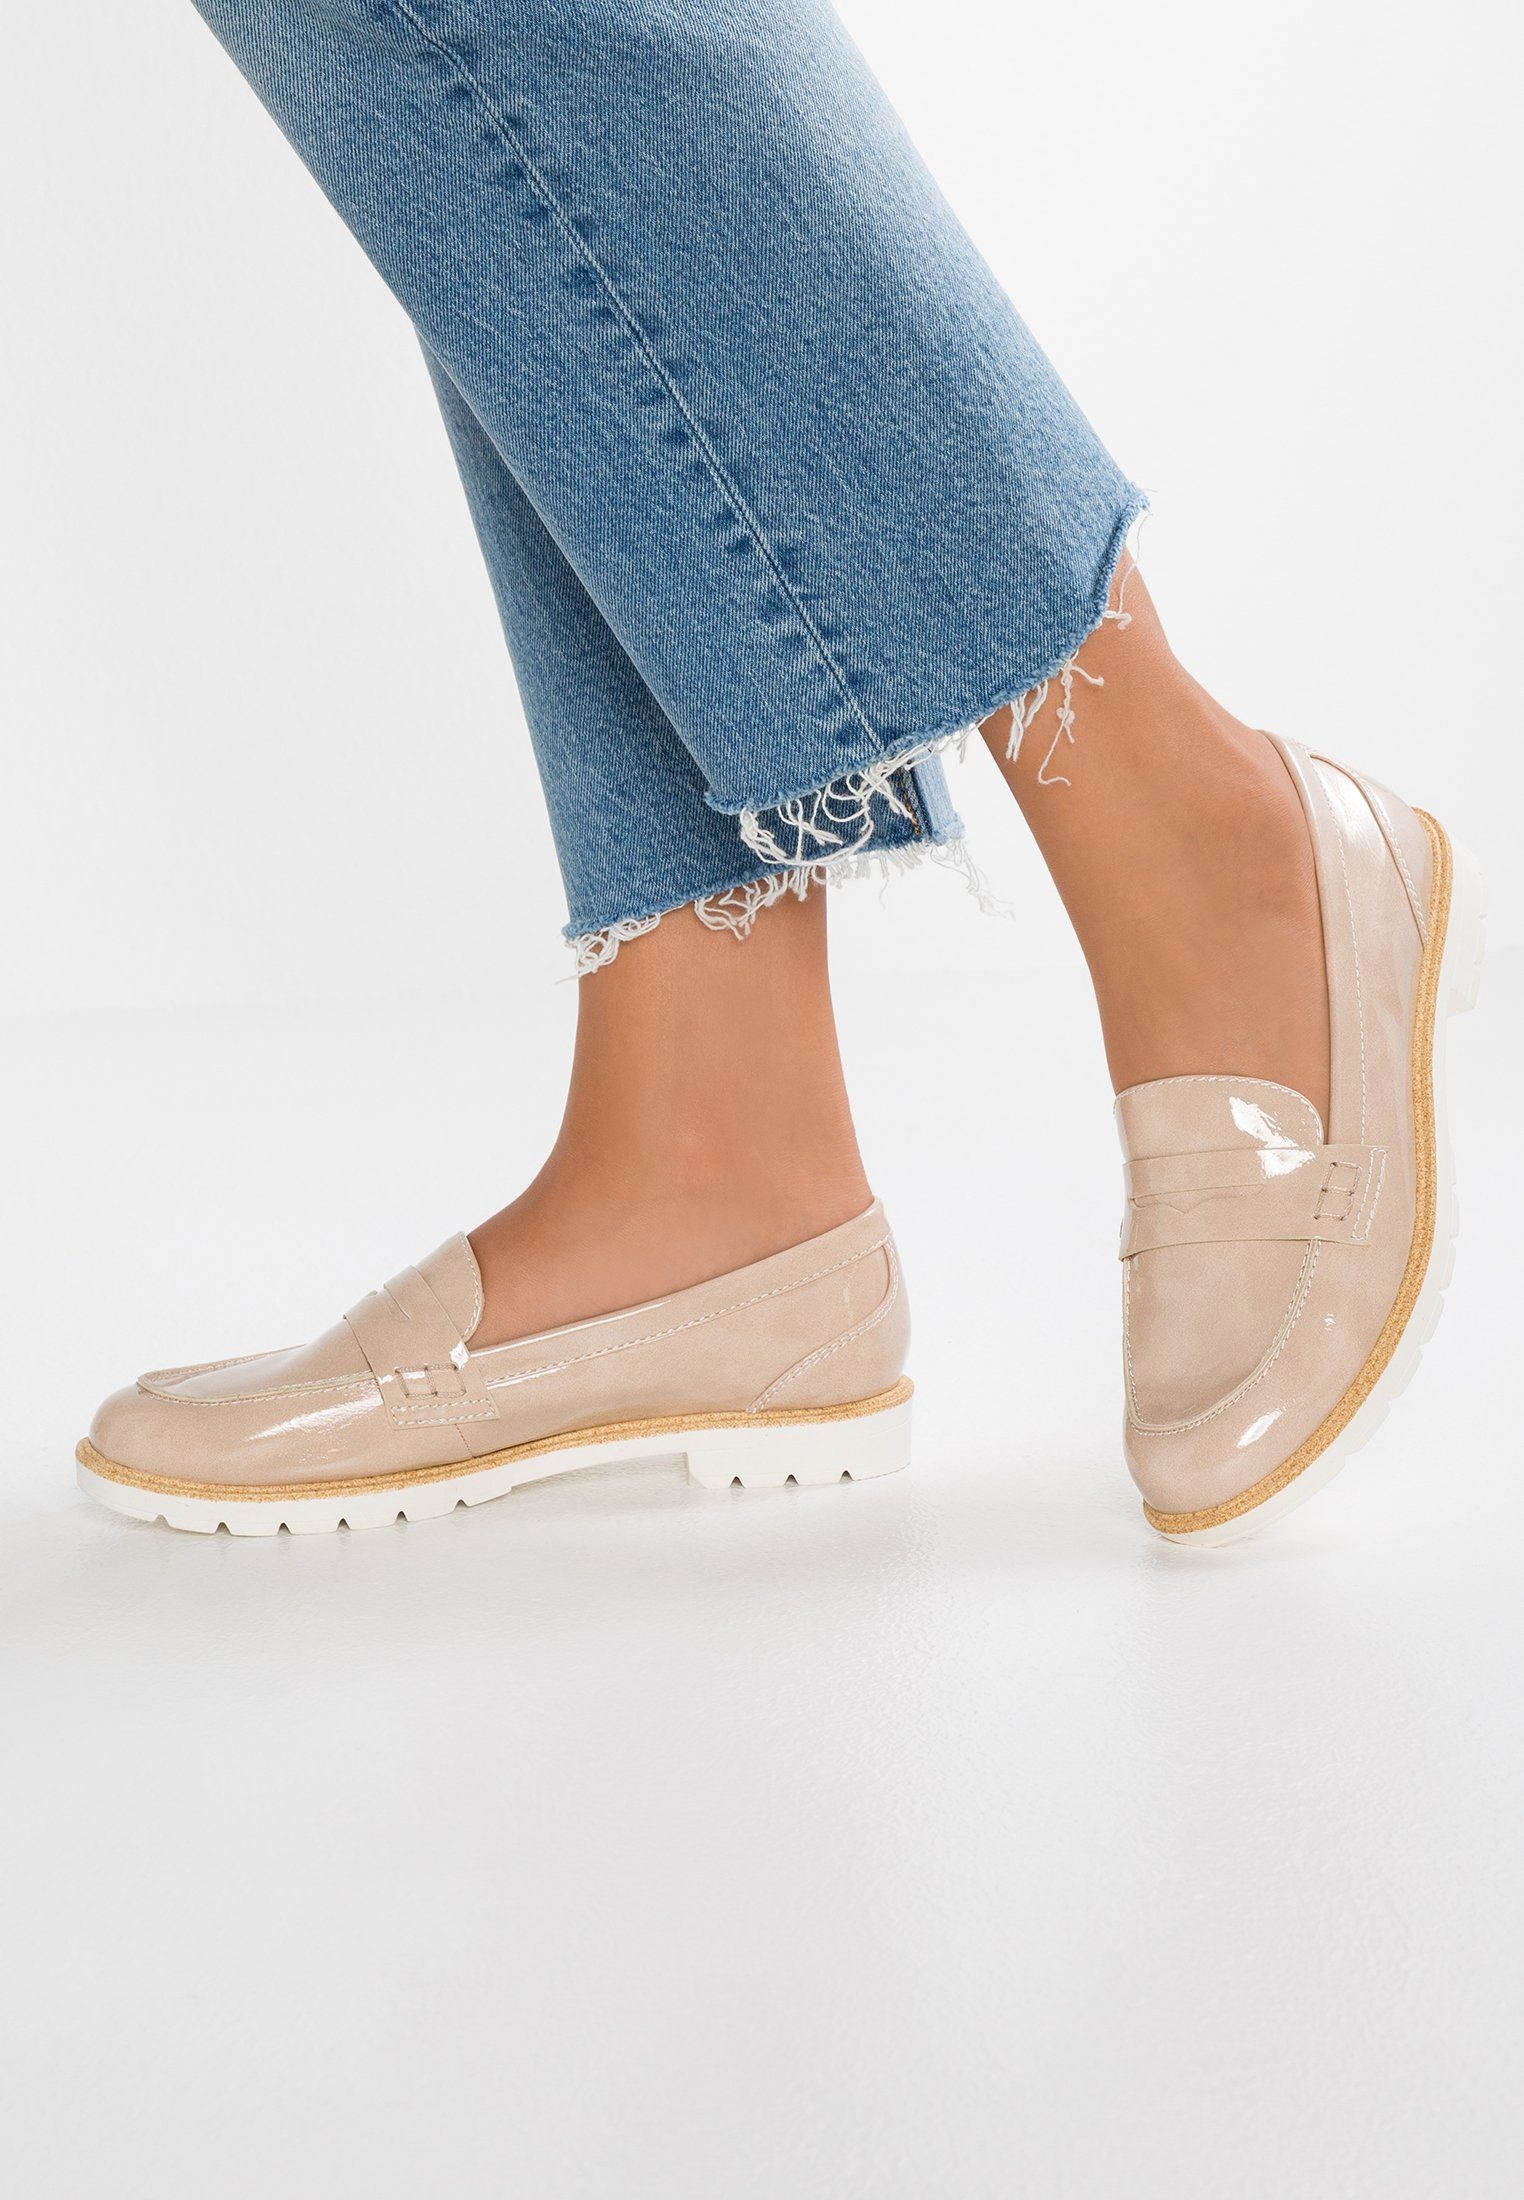 Tamaris Polbuty Wsuwane Cream Zalando Pl Espadrilles Slip On Sneaker Tamaris